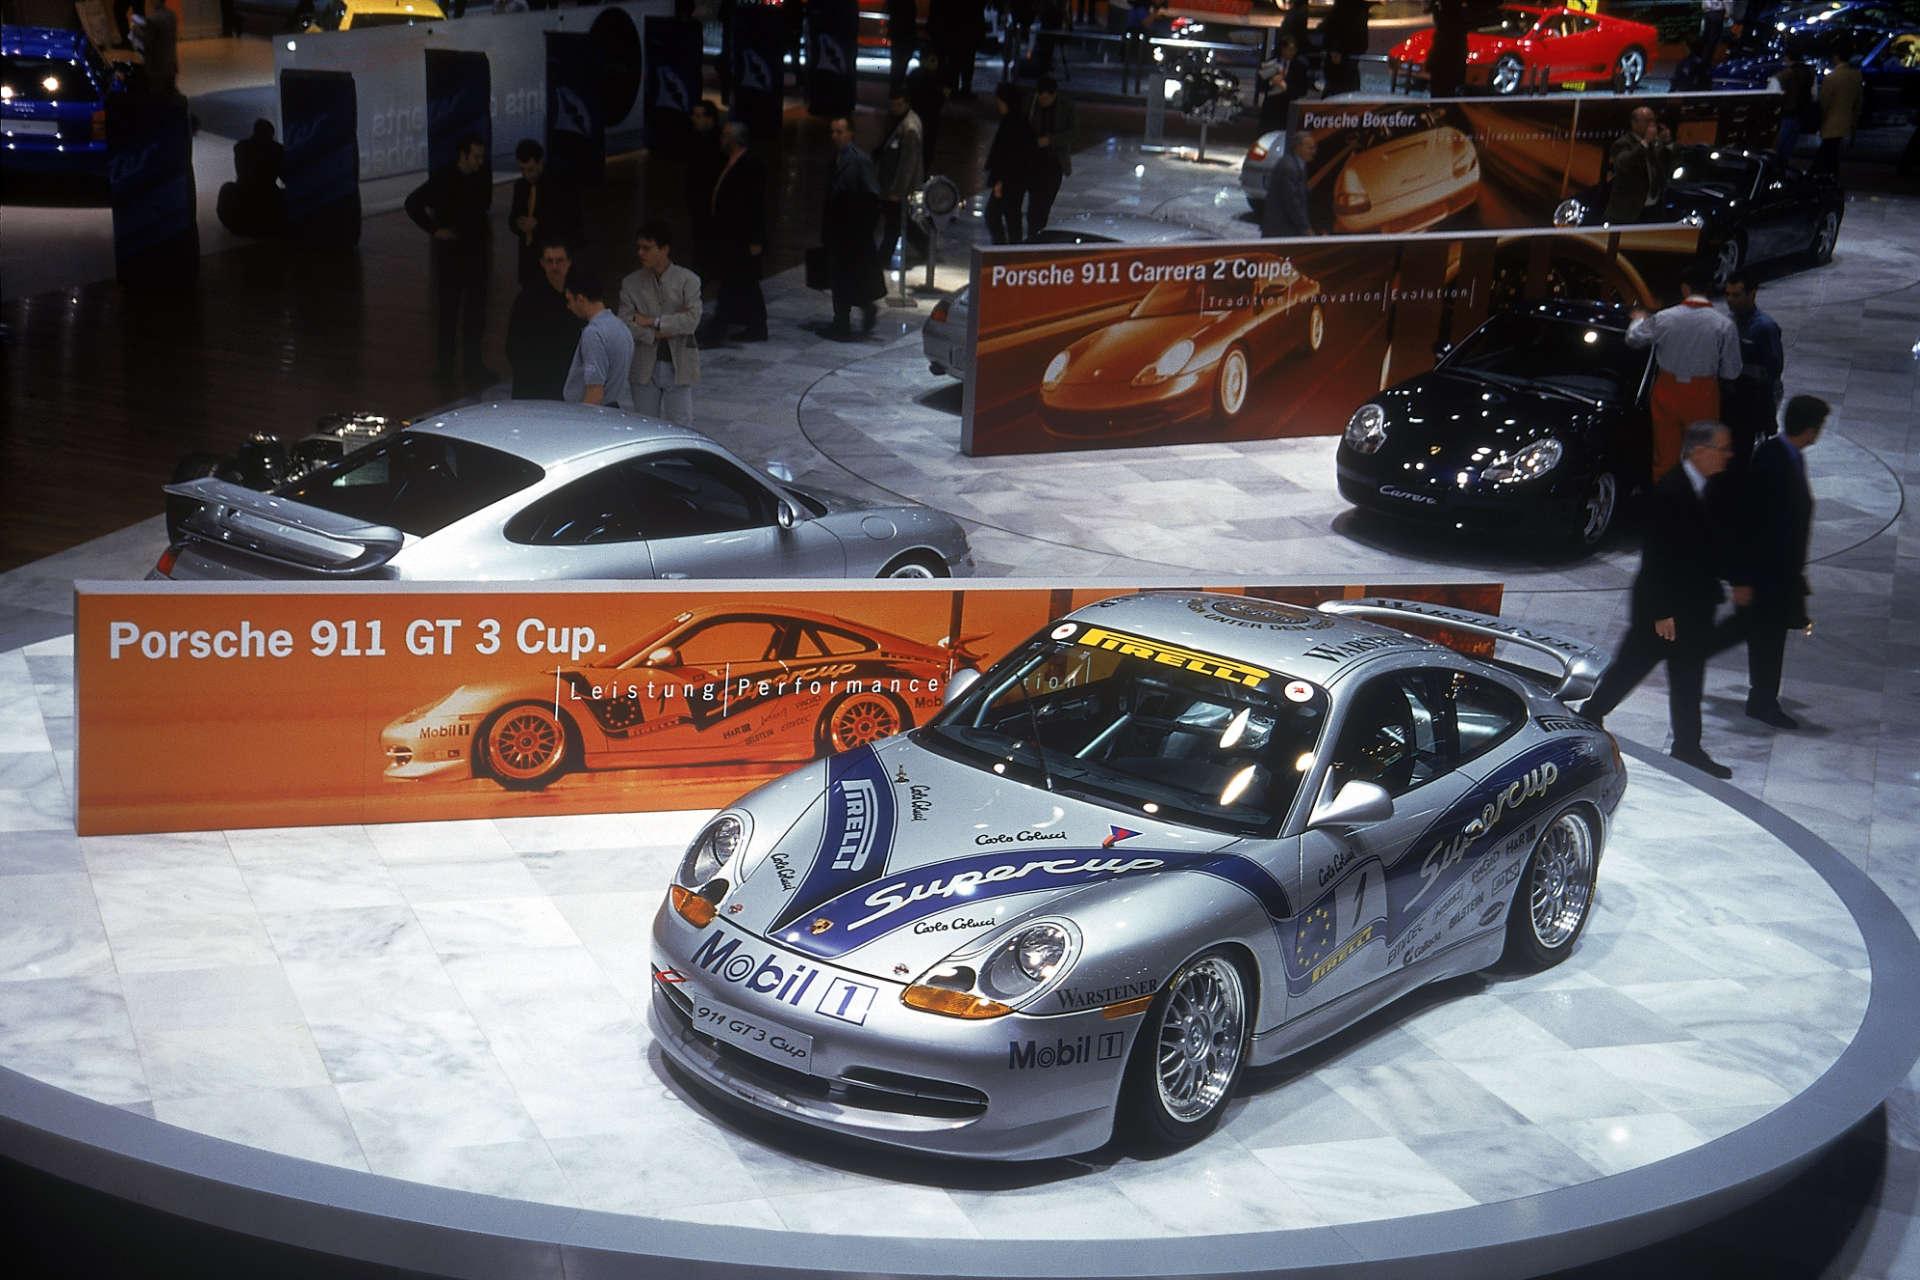 Der erste Porsche 911 GT3 Supercup